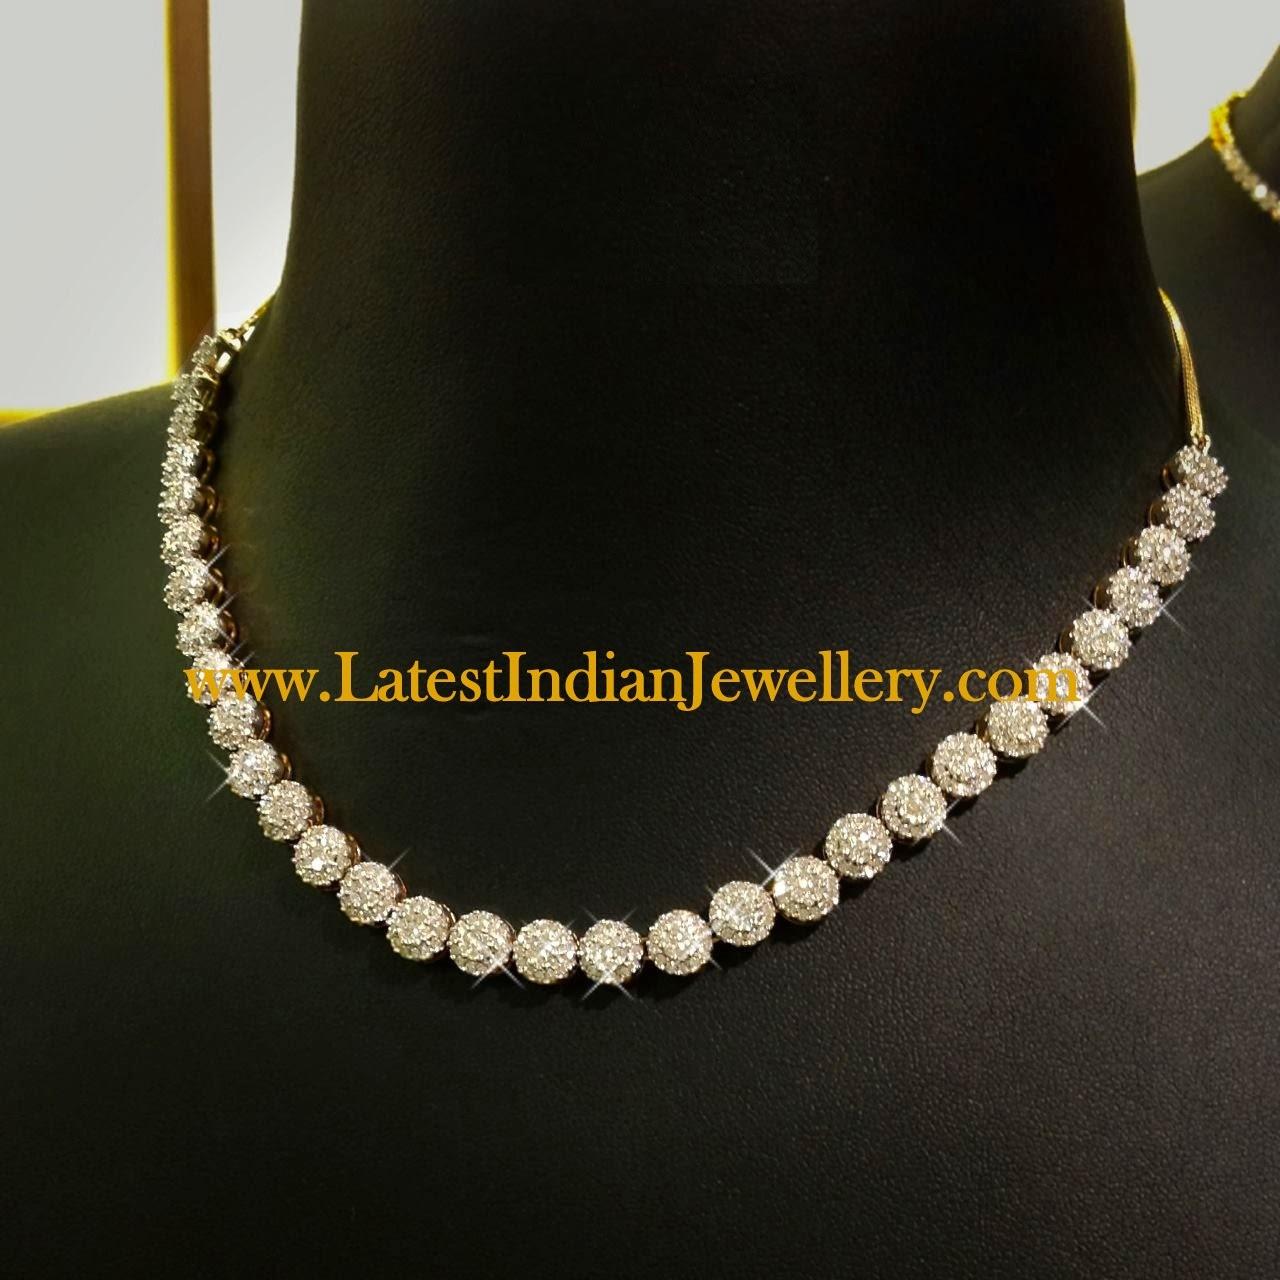 stylish single row diamond necklace. Black Bedroom Furniture Sets. Home Design Ideas